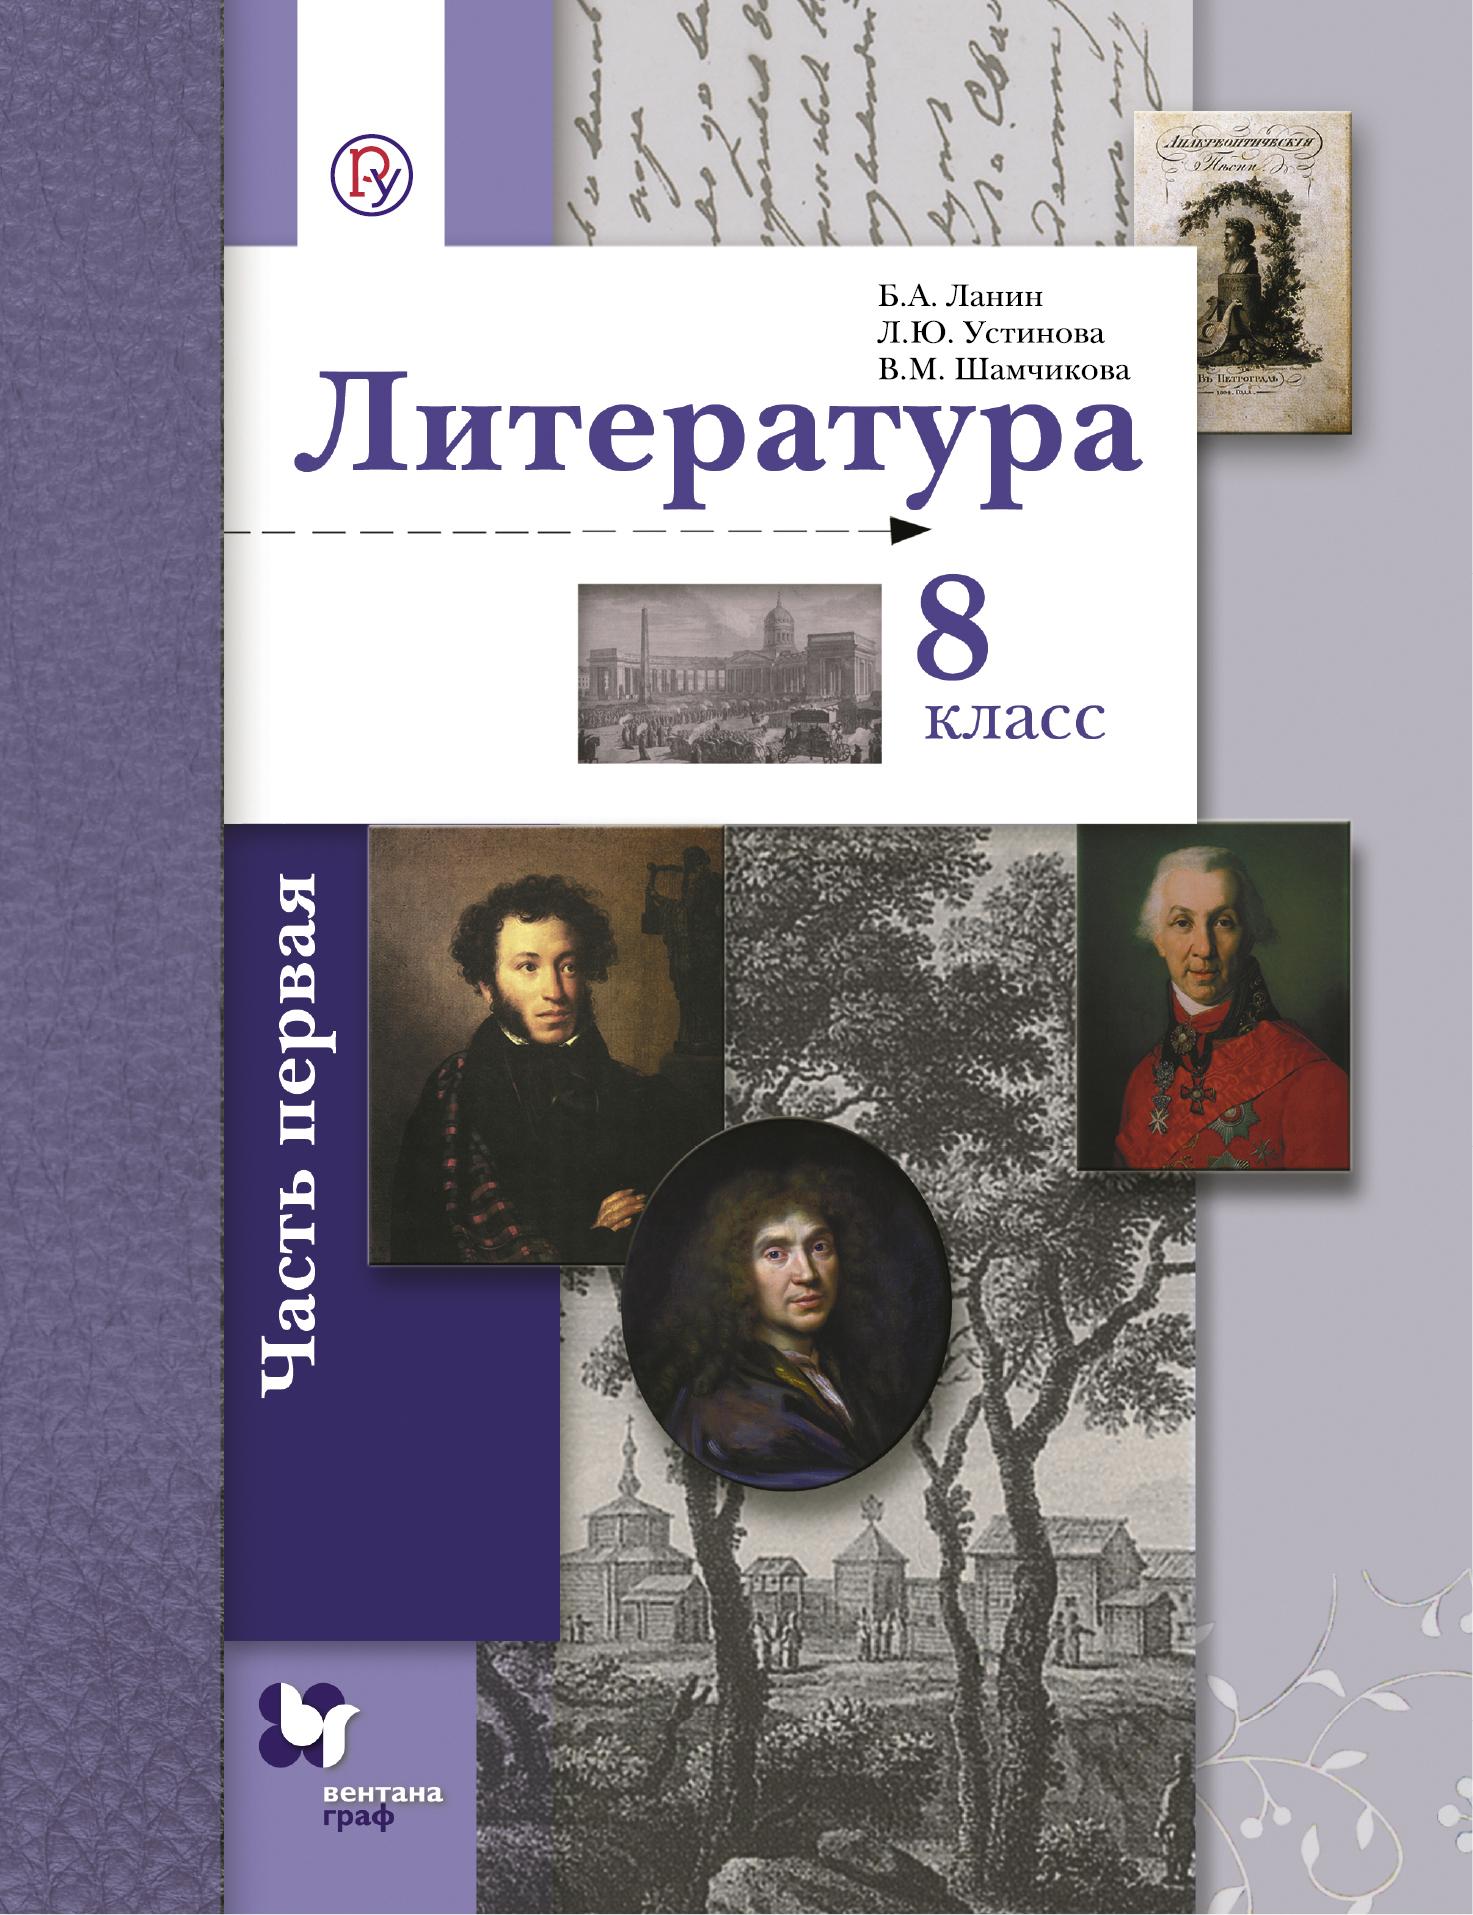 Литература. 8кл. Учебник Ч.1.